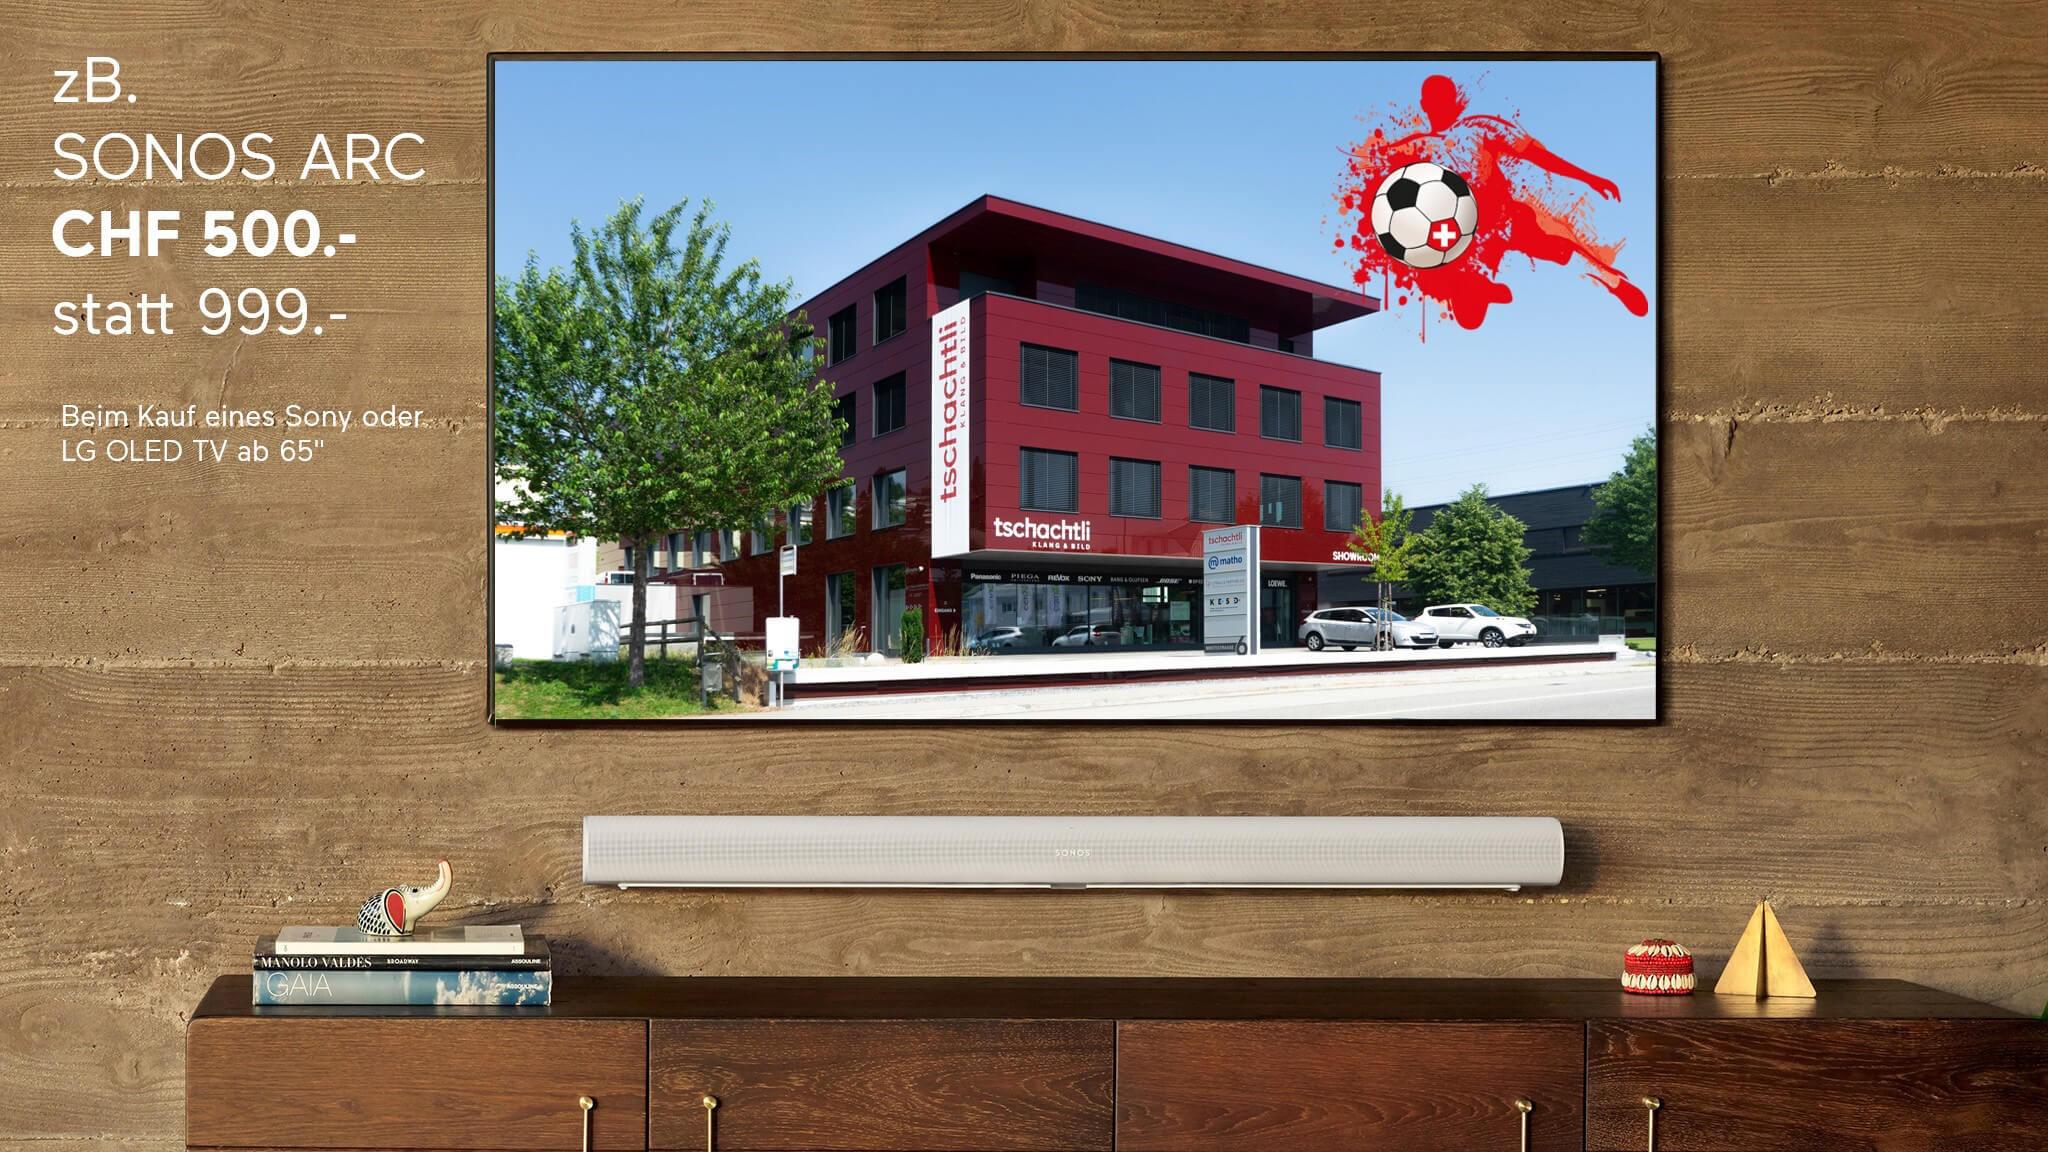 Sonos-Arc_Fussball Kopie